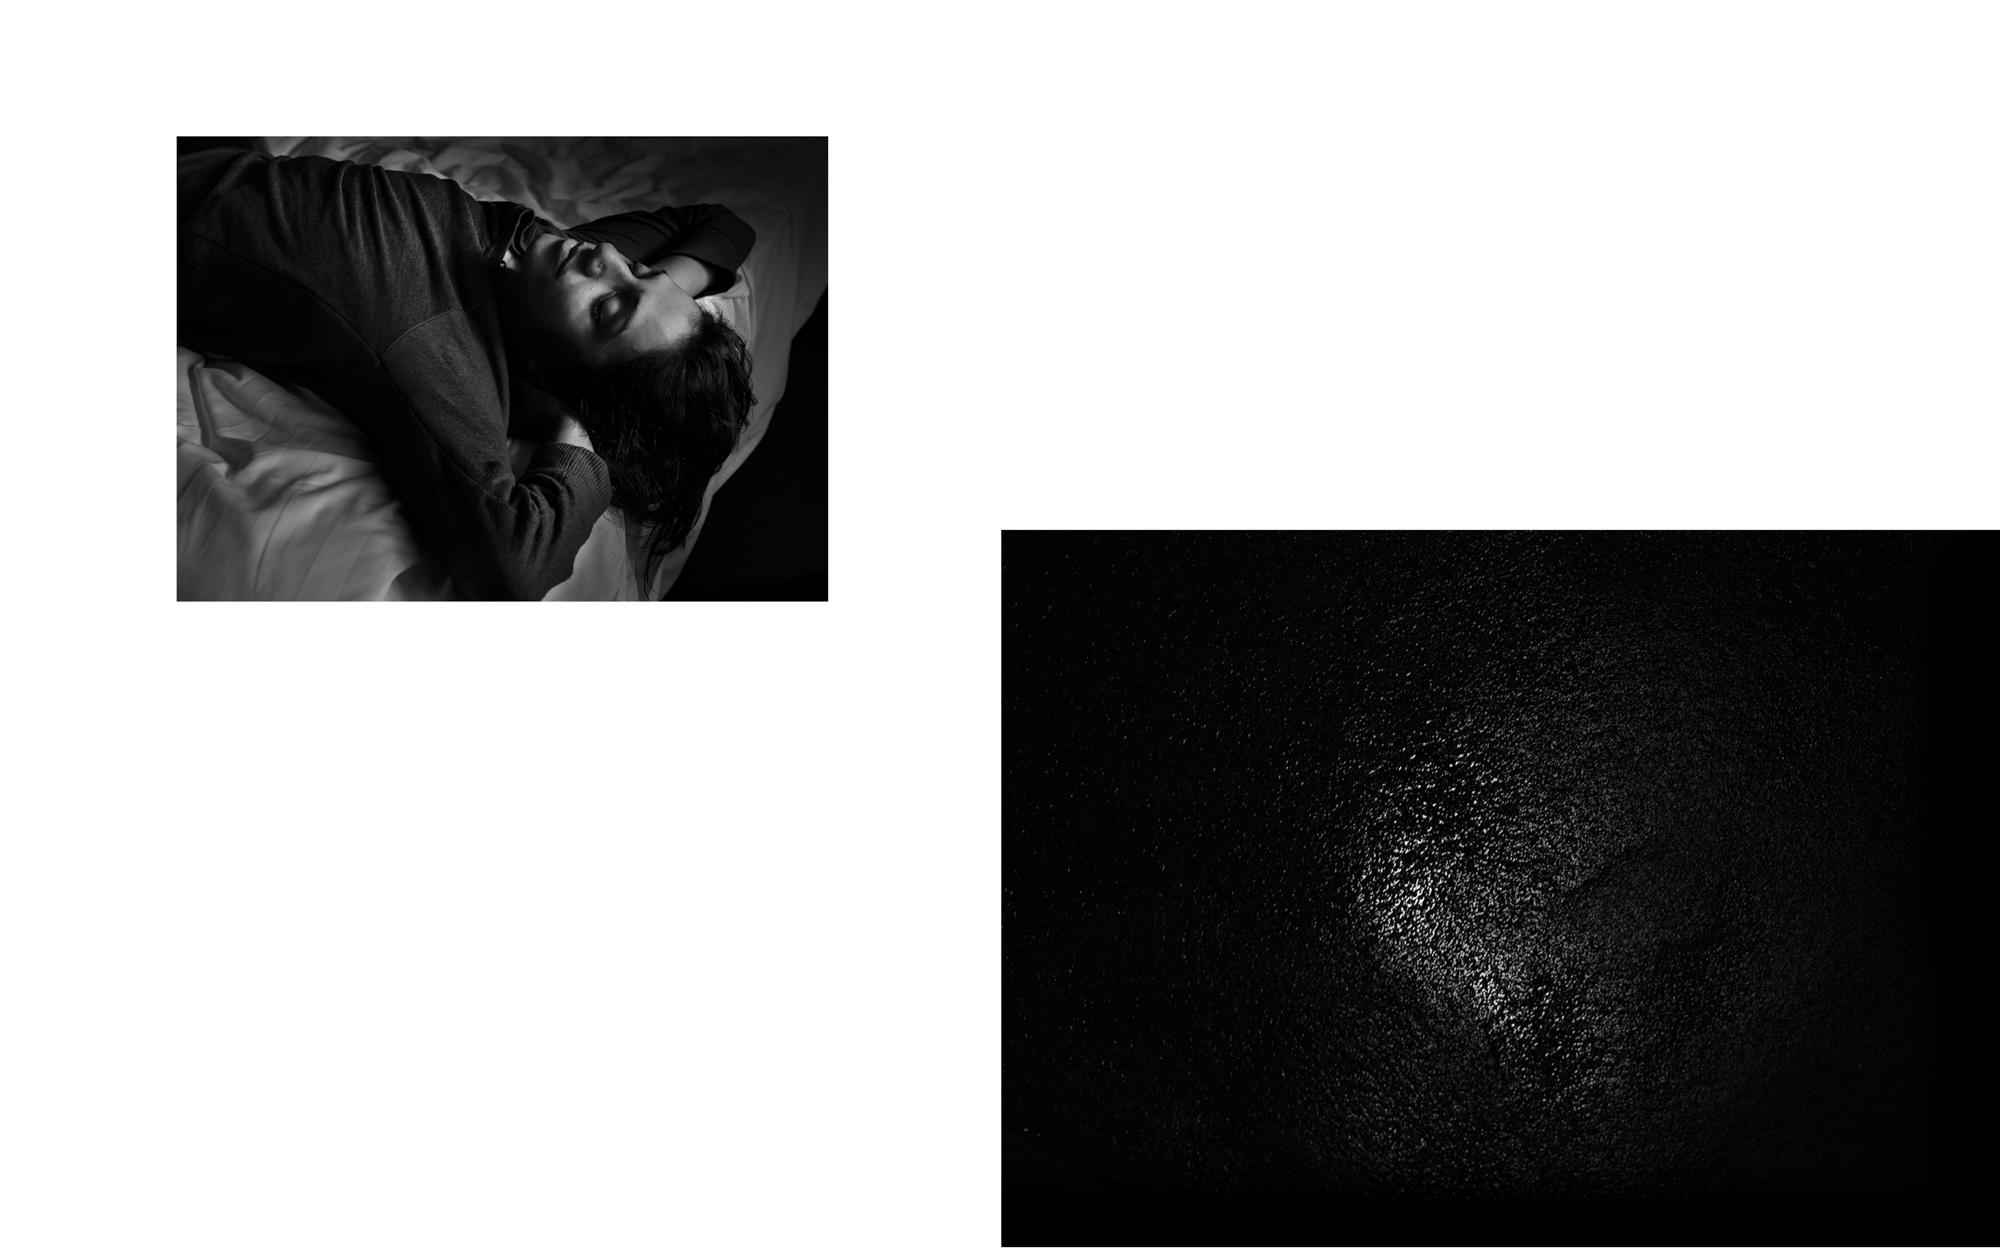 Immanence-10.jpg